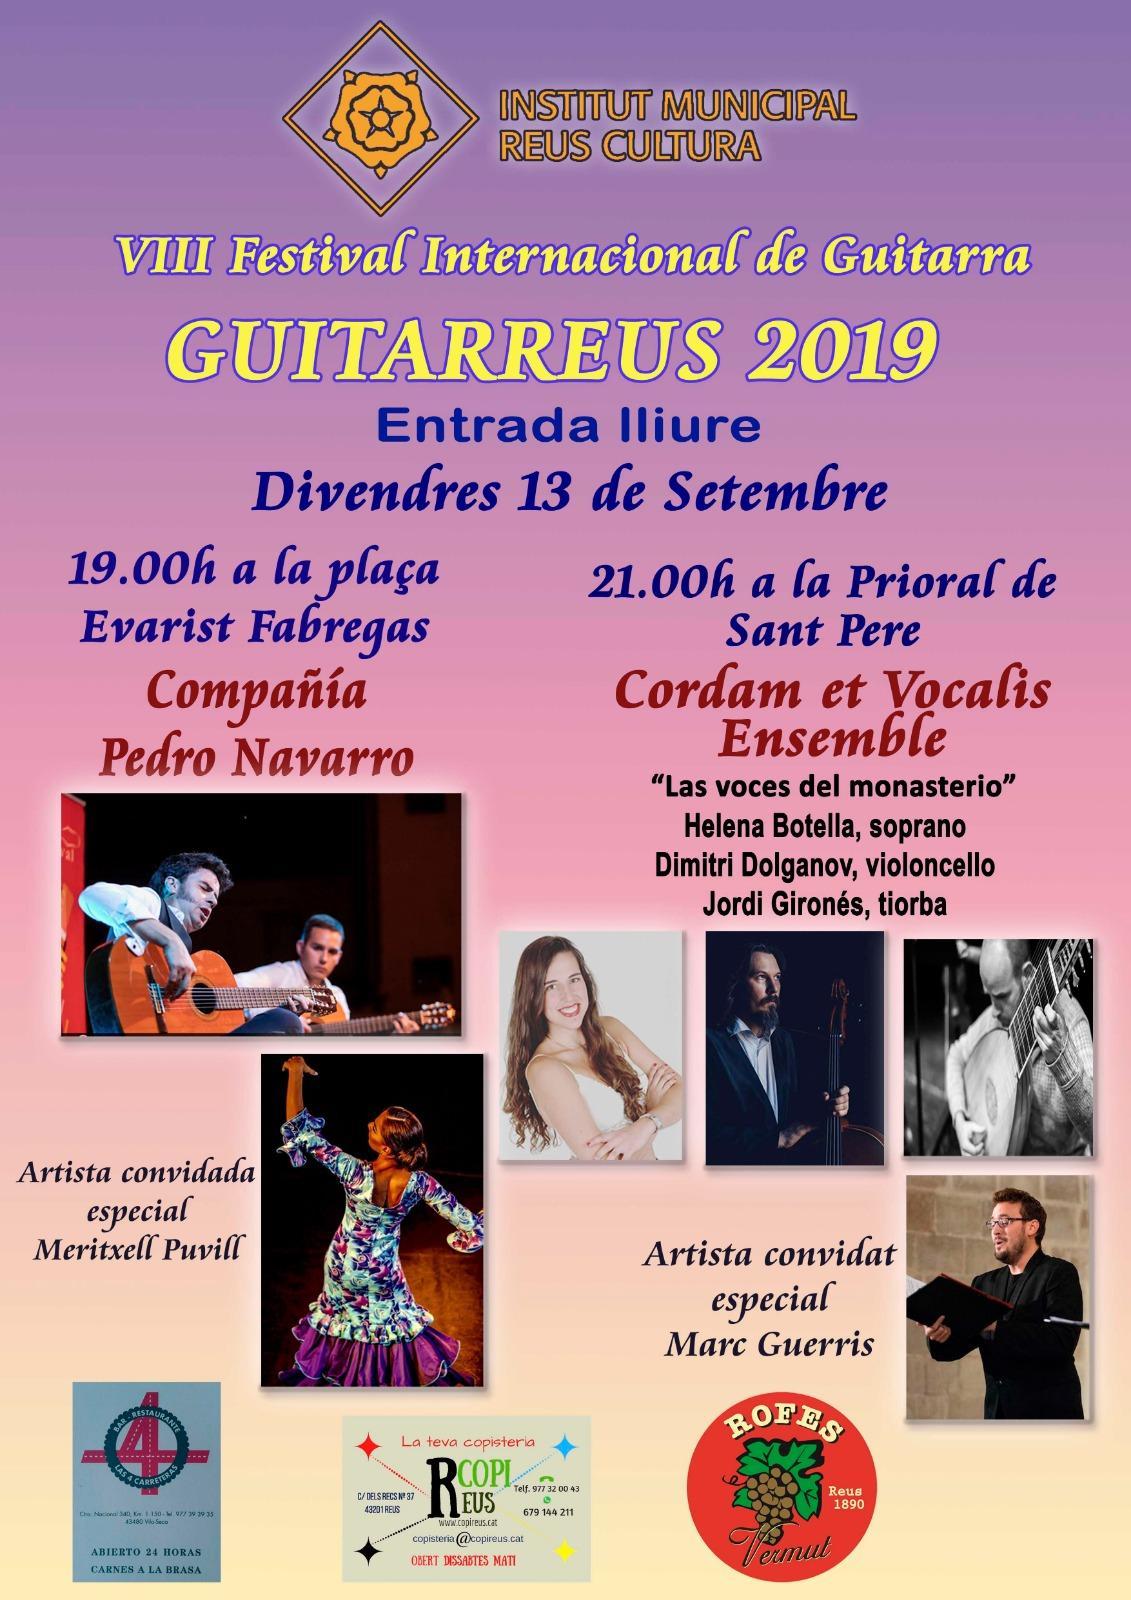 VIII Festival Internacional de Guitarra. Concert